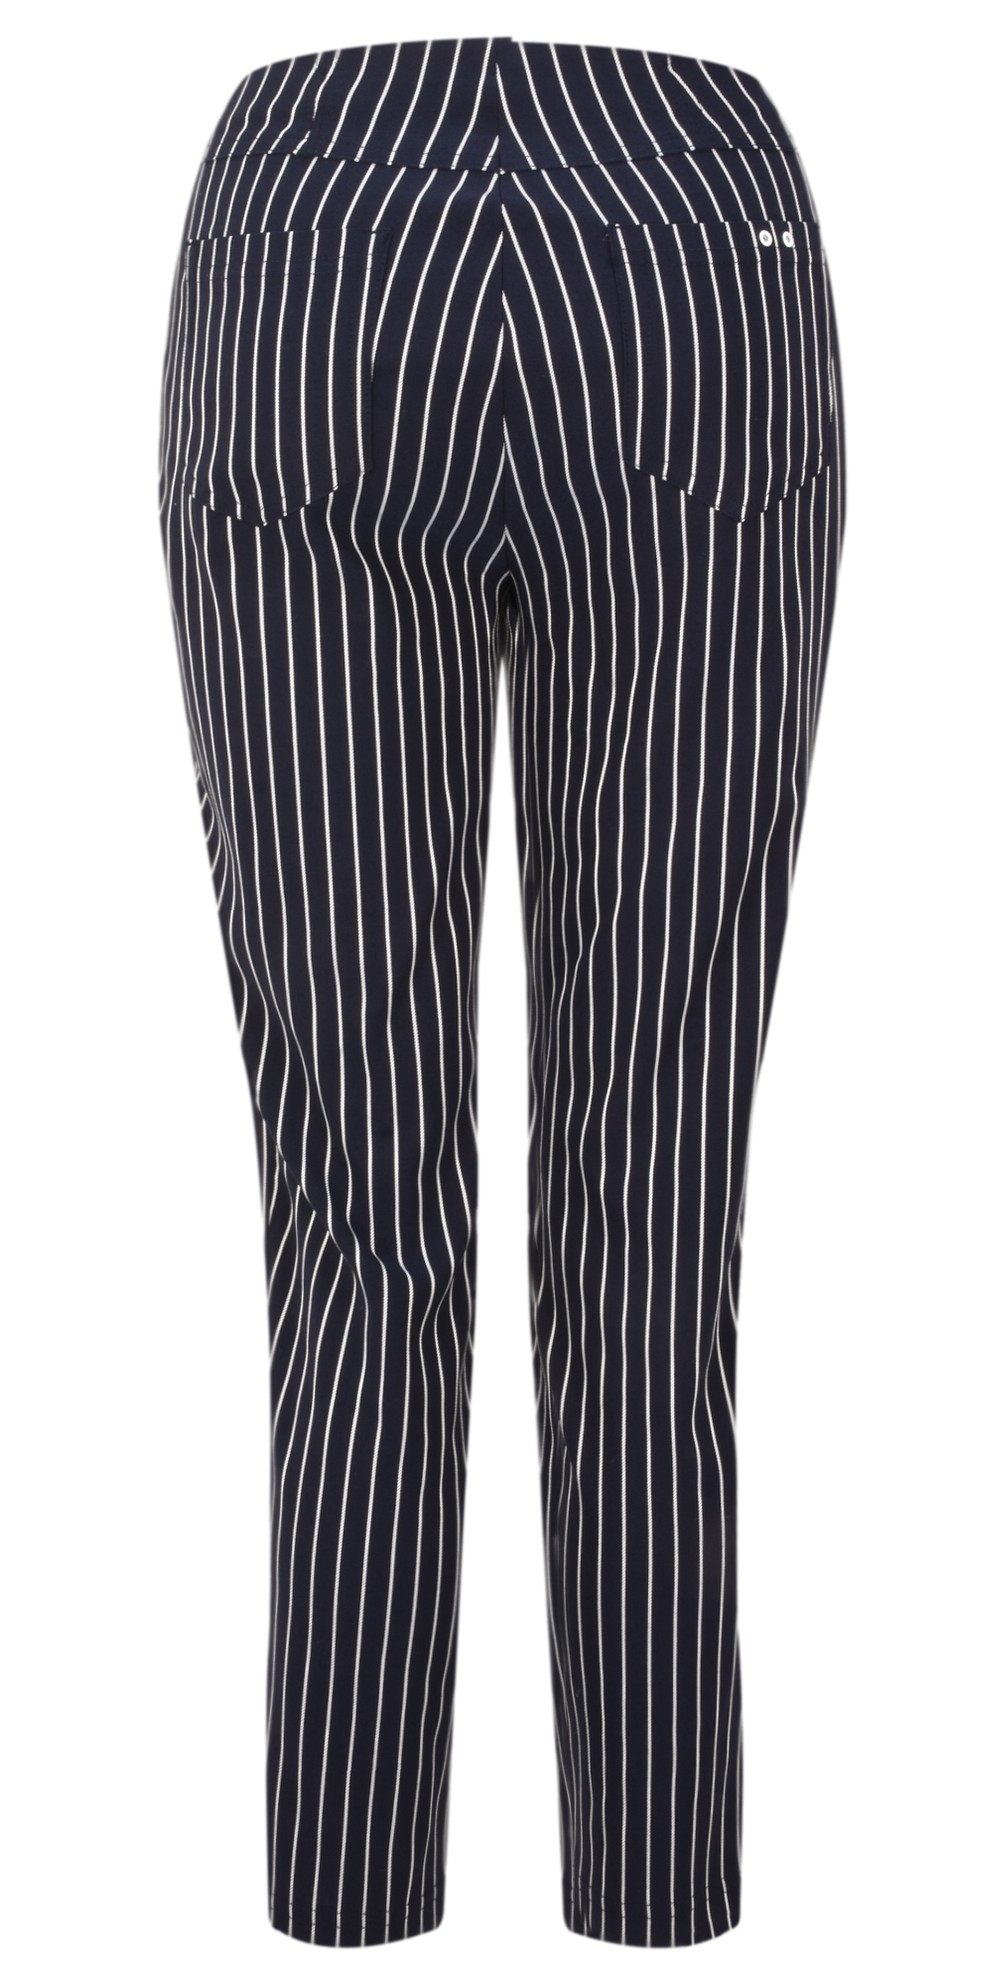 Bella 09 Pin-Stripe Cropped Trouser main image